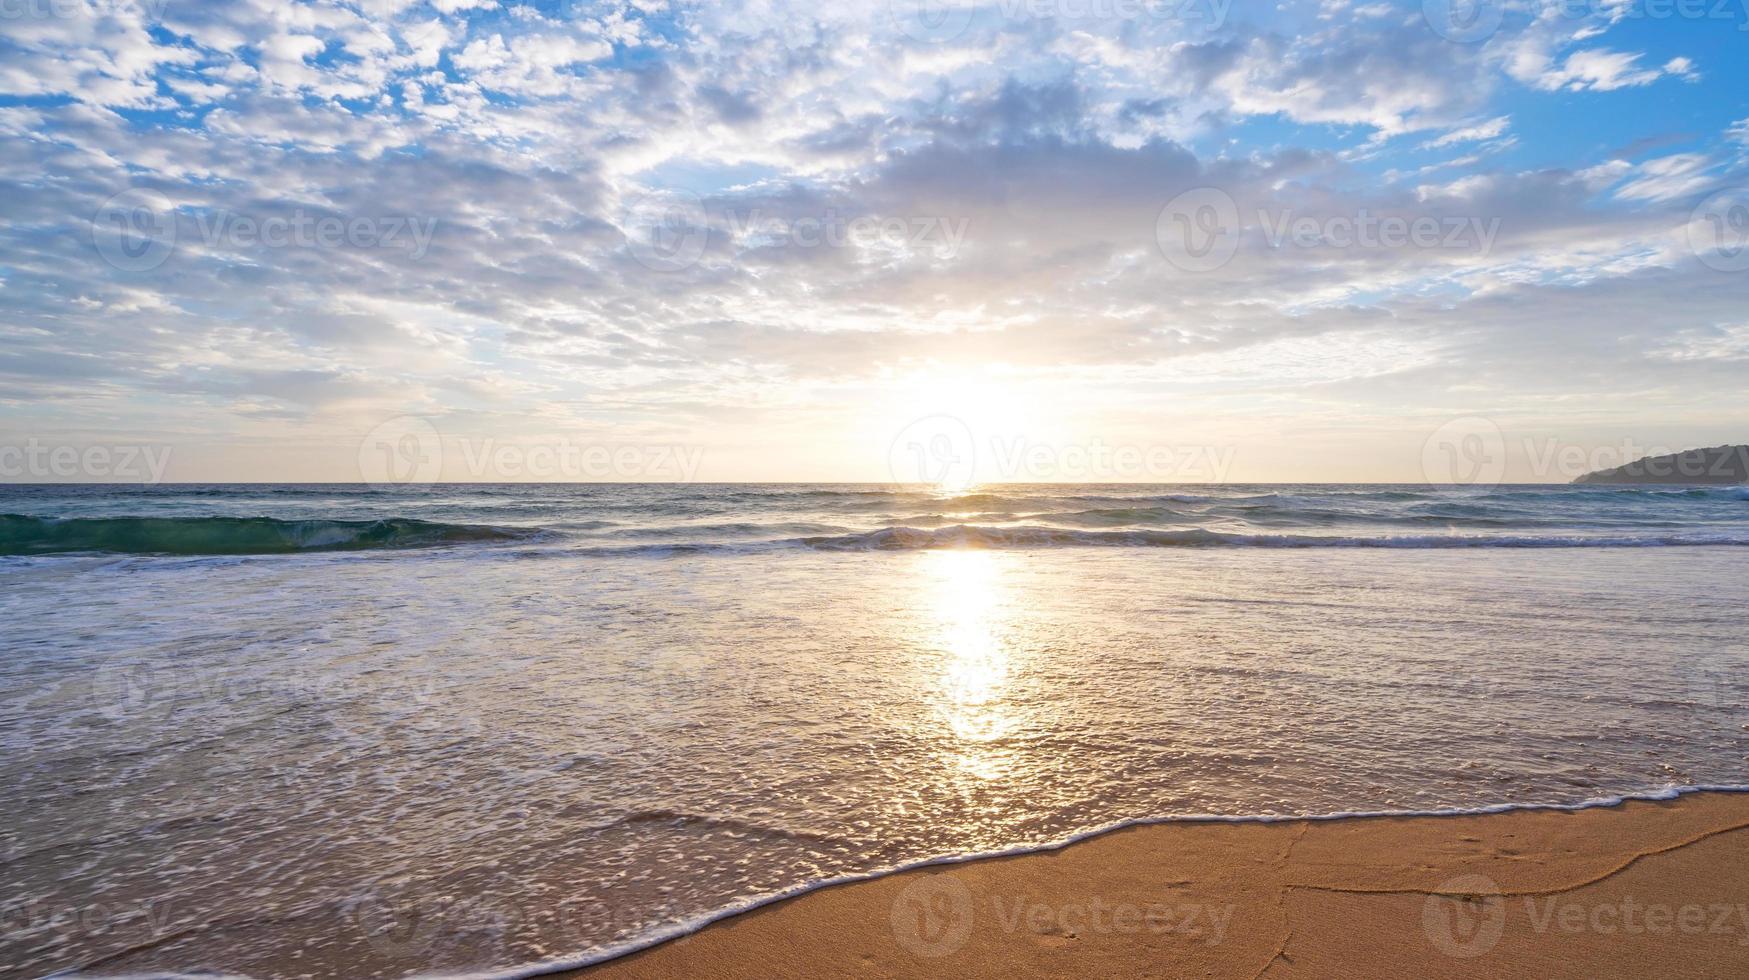 incrível mar de praia tropical foto